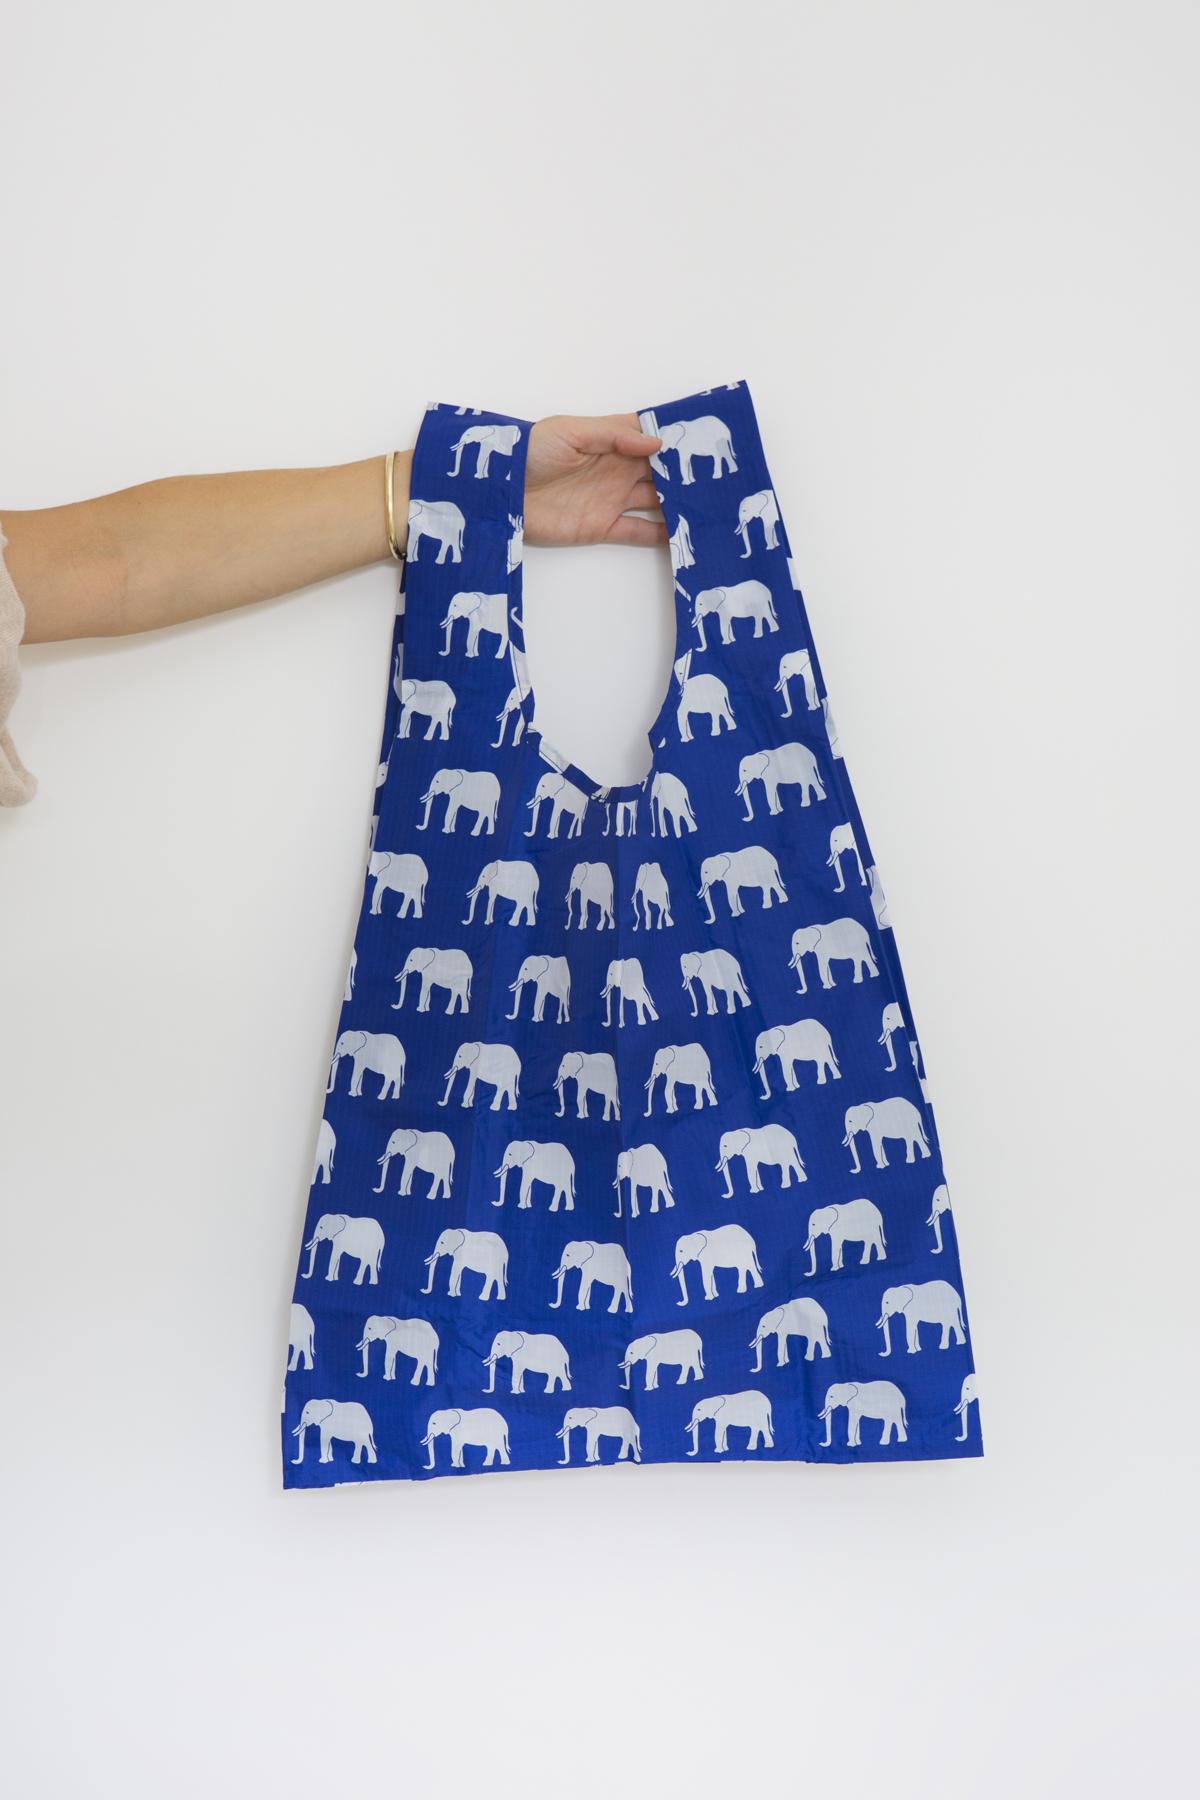 standard-bag-elephant-blue-shopping-nylon-eco-friendly-baggu-matchboxathens